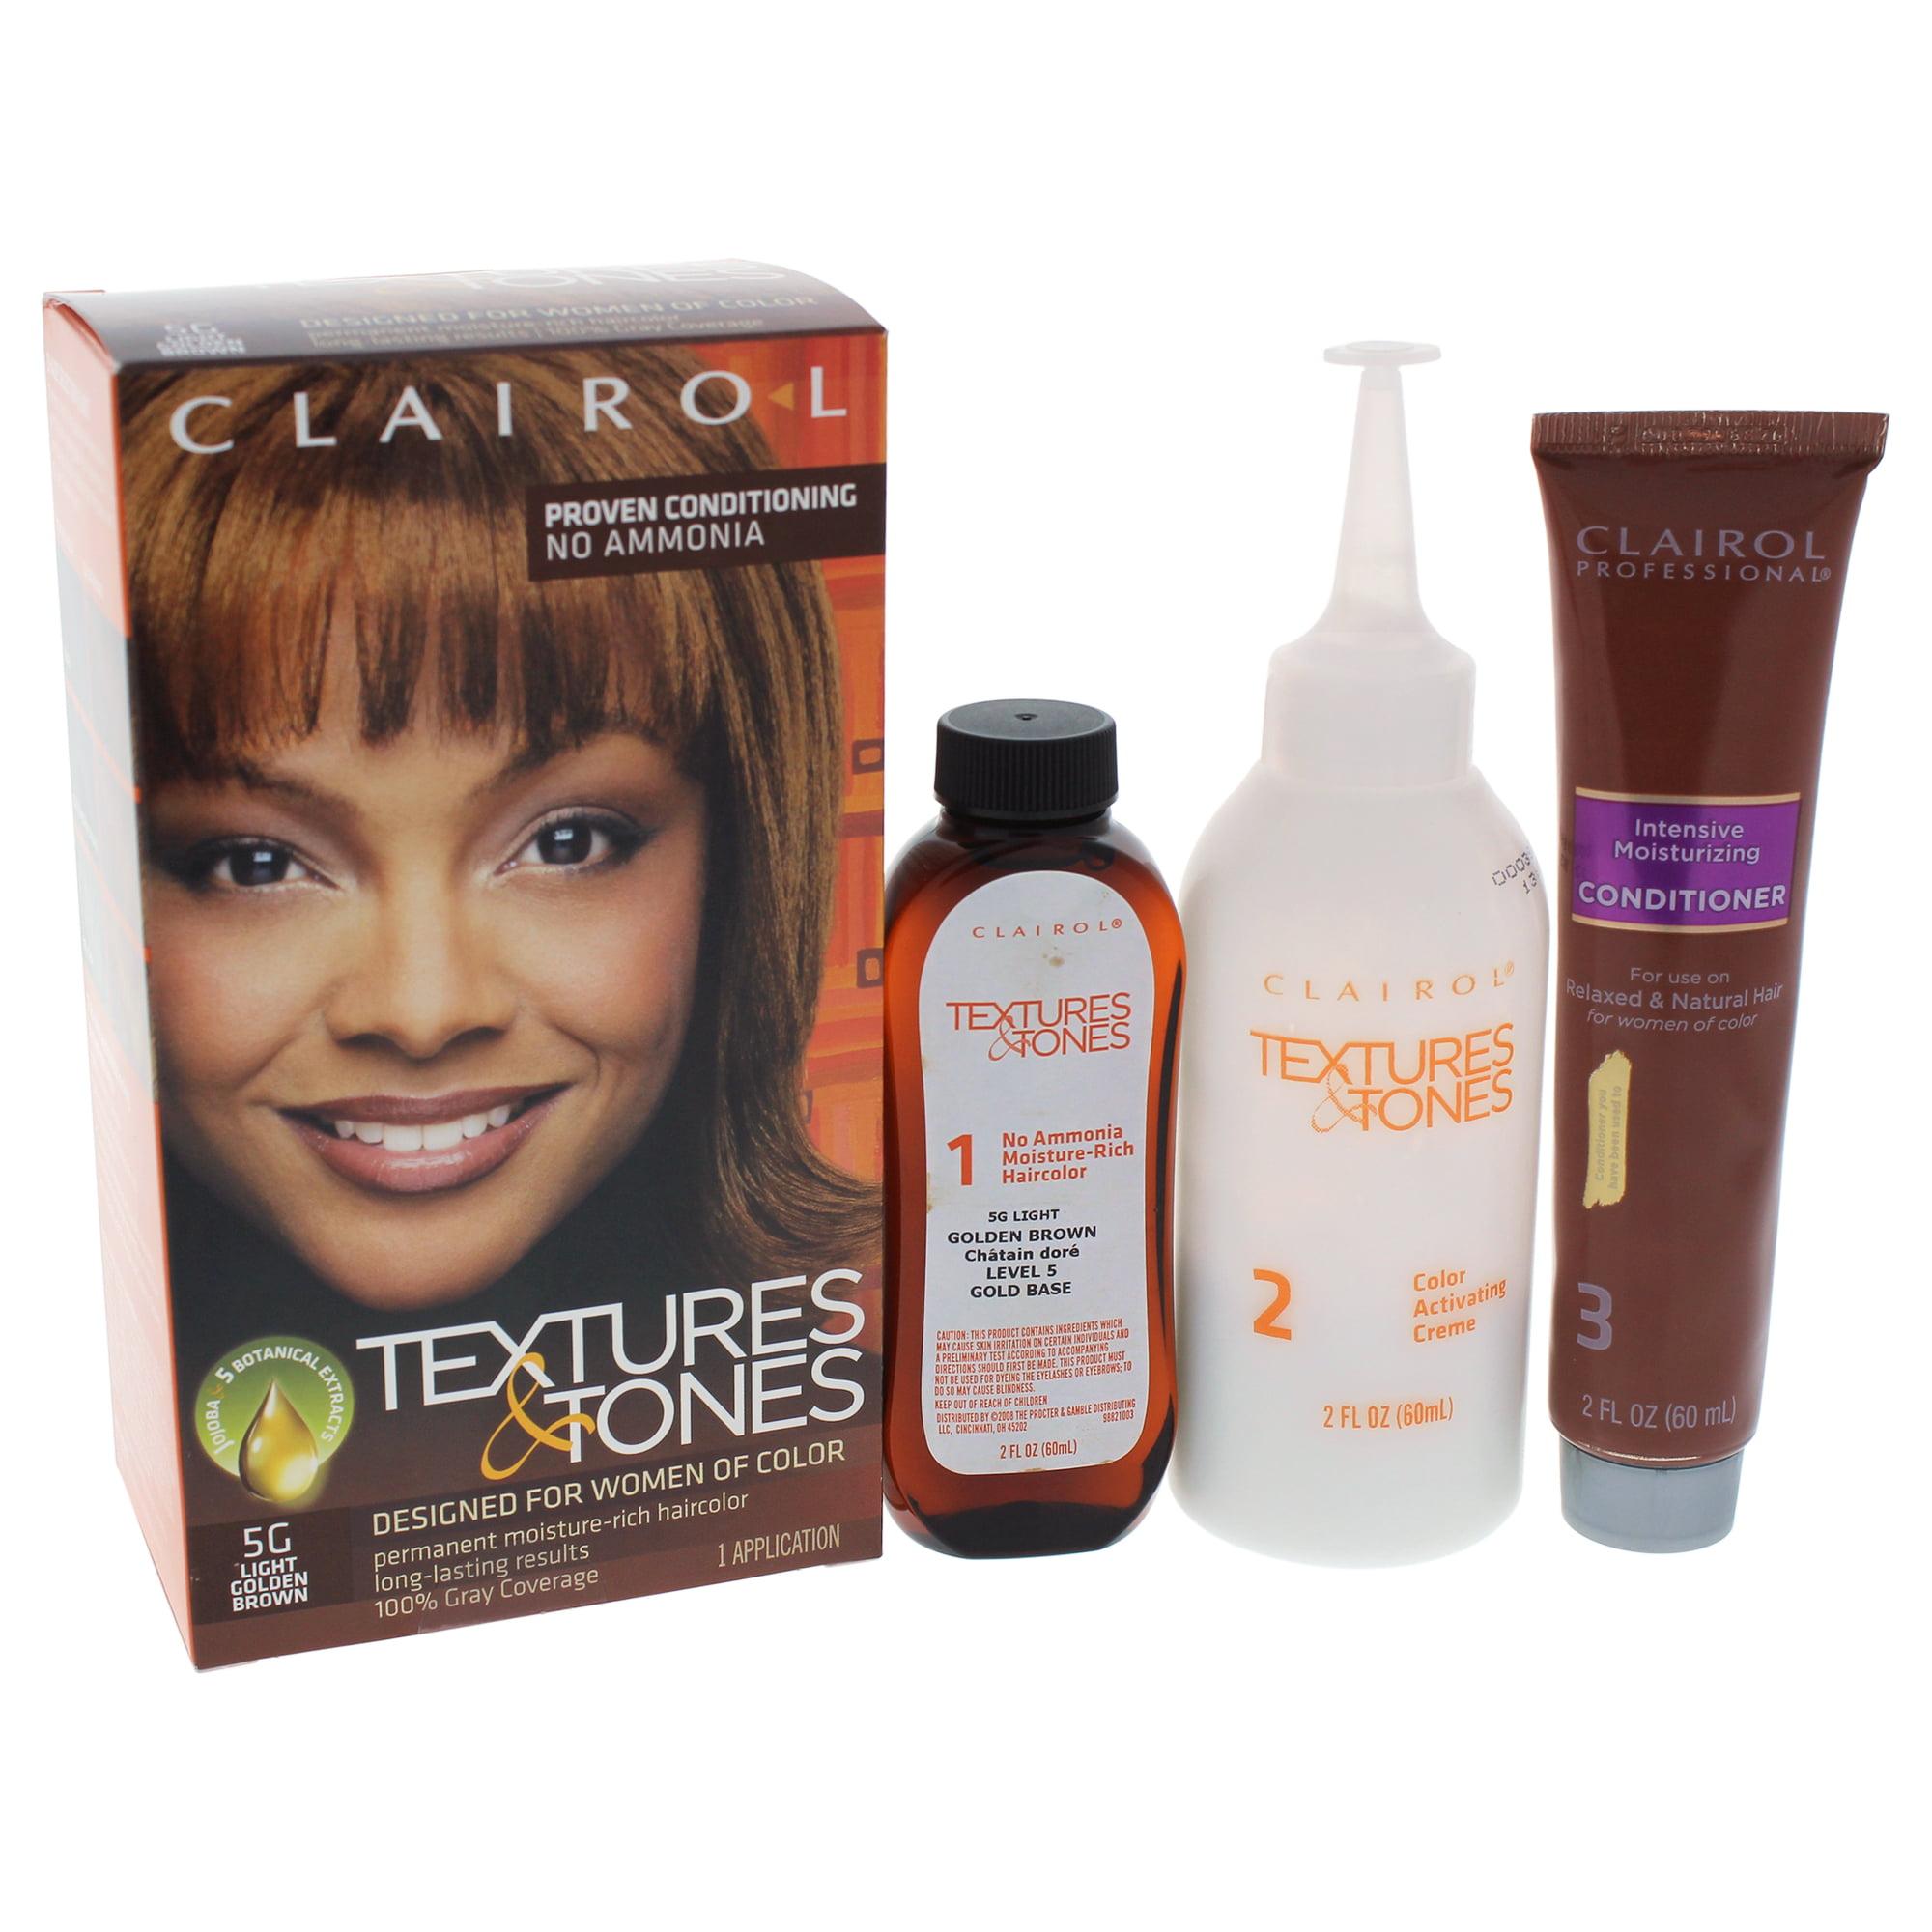 Clairol Textures & Tones Permanent Moisture-Rich Haircolor - # 1B Silken Black - 1 Application Hair Color